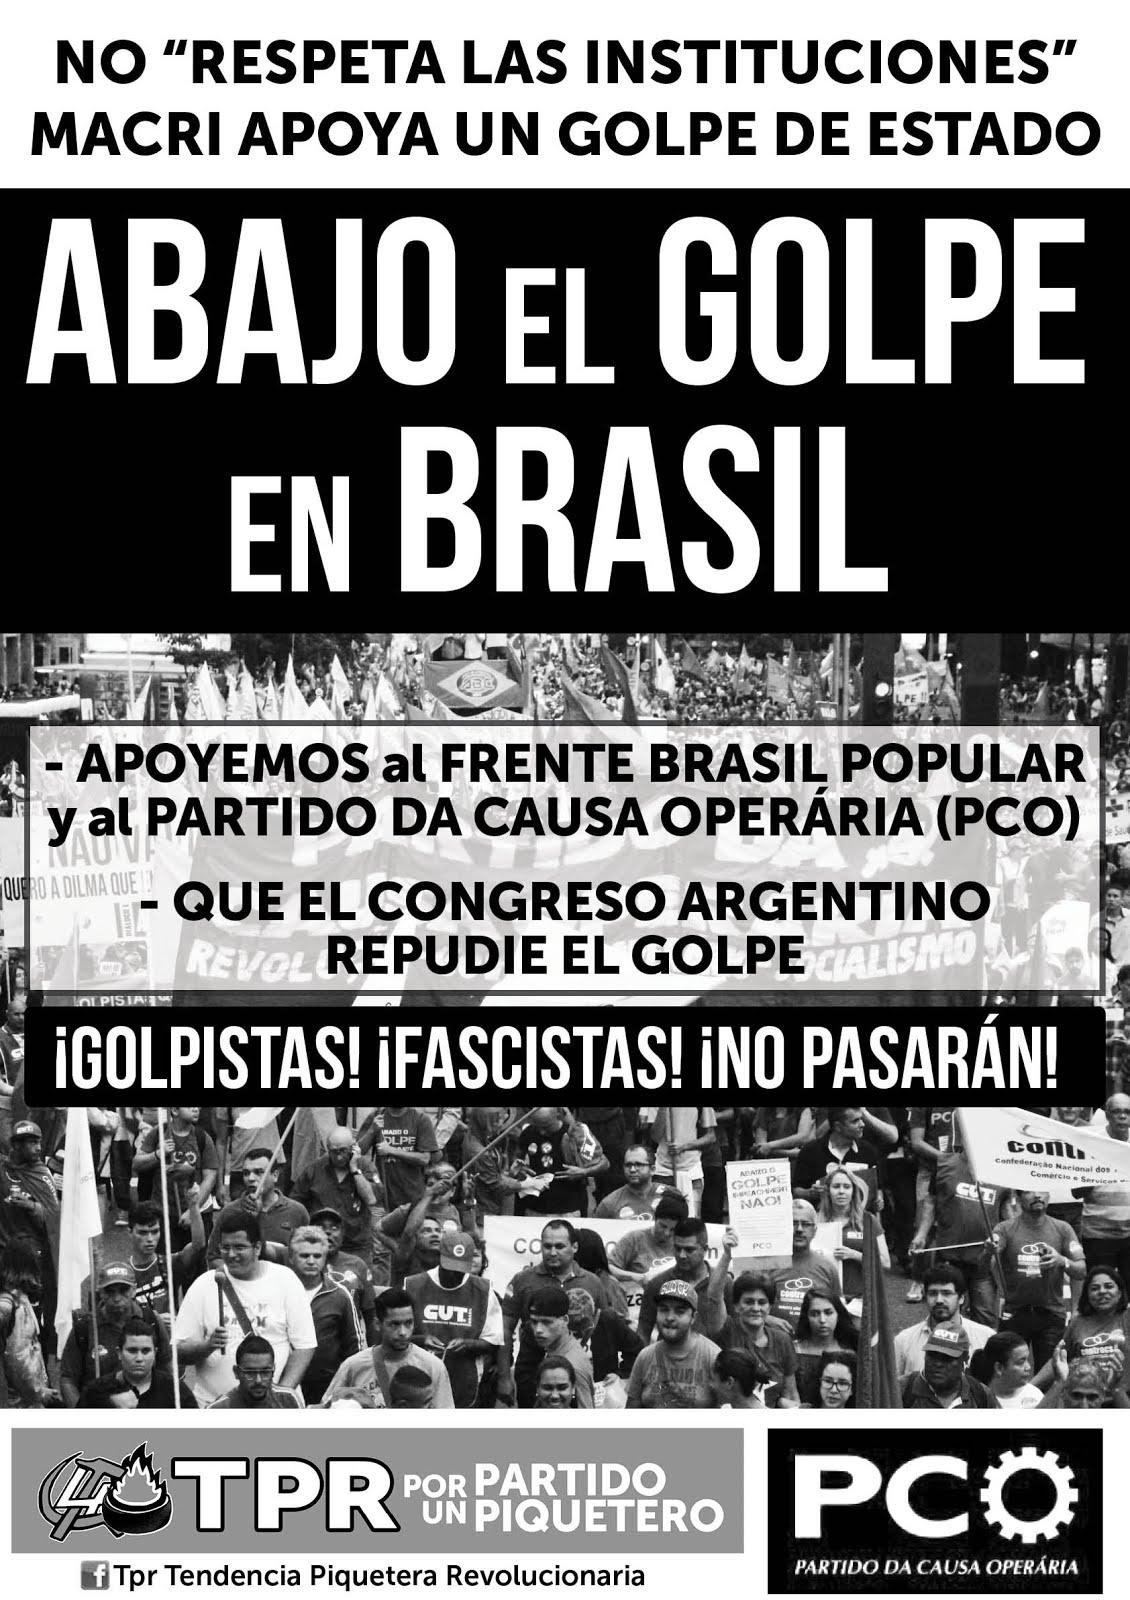 [AFICHE TPR-PCO] ¡ABAJO EL GOLPE EN BRASIL!